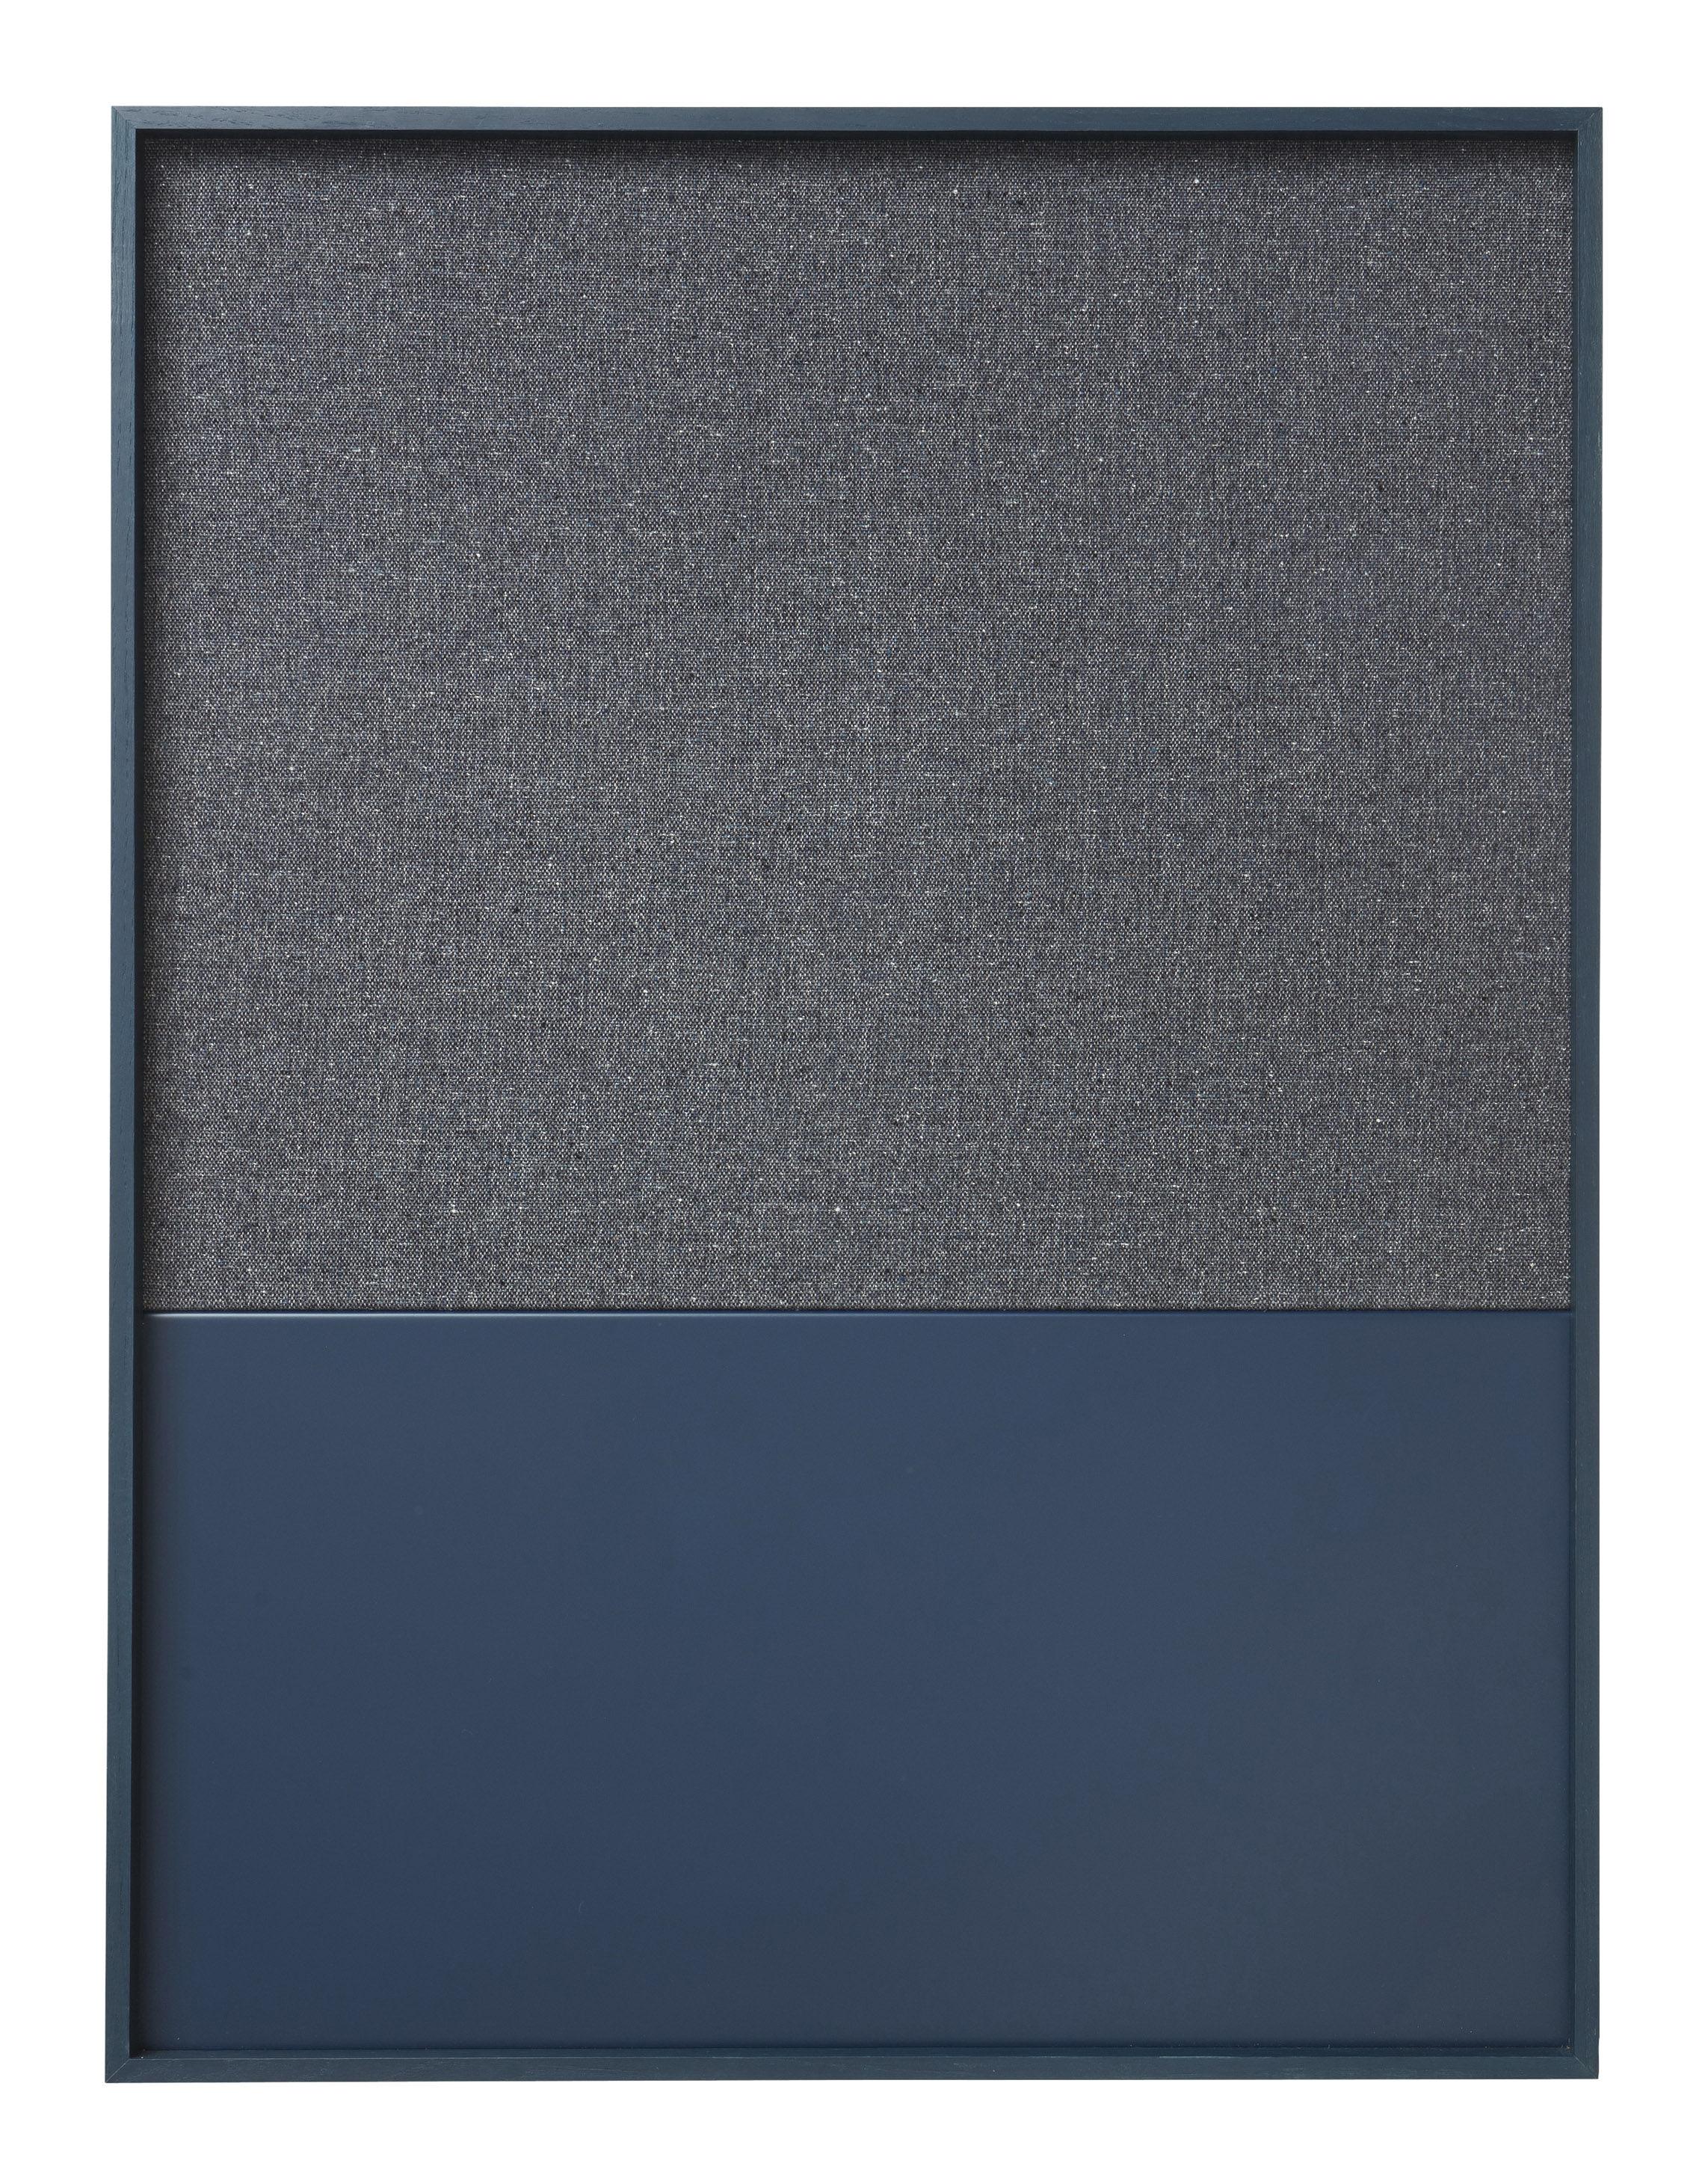 Accessories - Desk & Office Accessories - Frame Pinboard Memo board - 62 x 82 cm by Ferm Living - Dark blue - Cork, Cotton, Lacquered metal, Oak